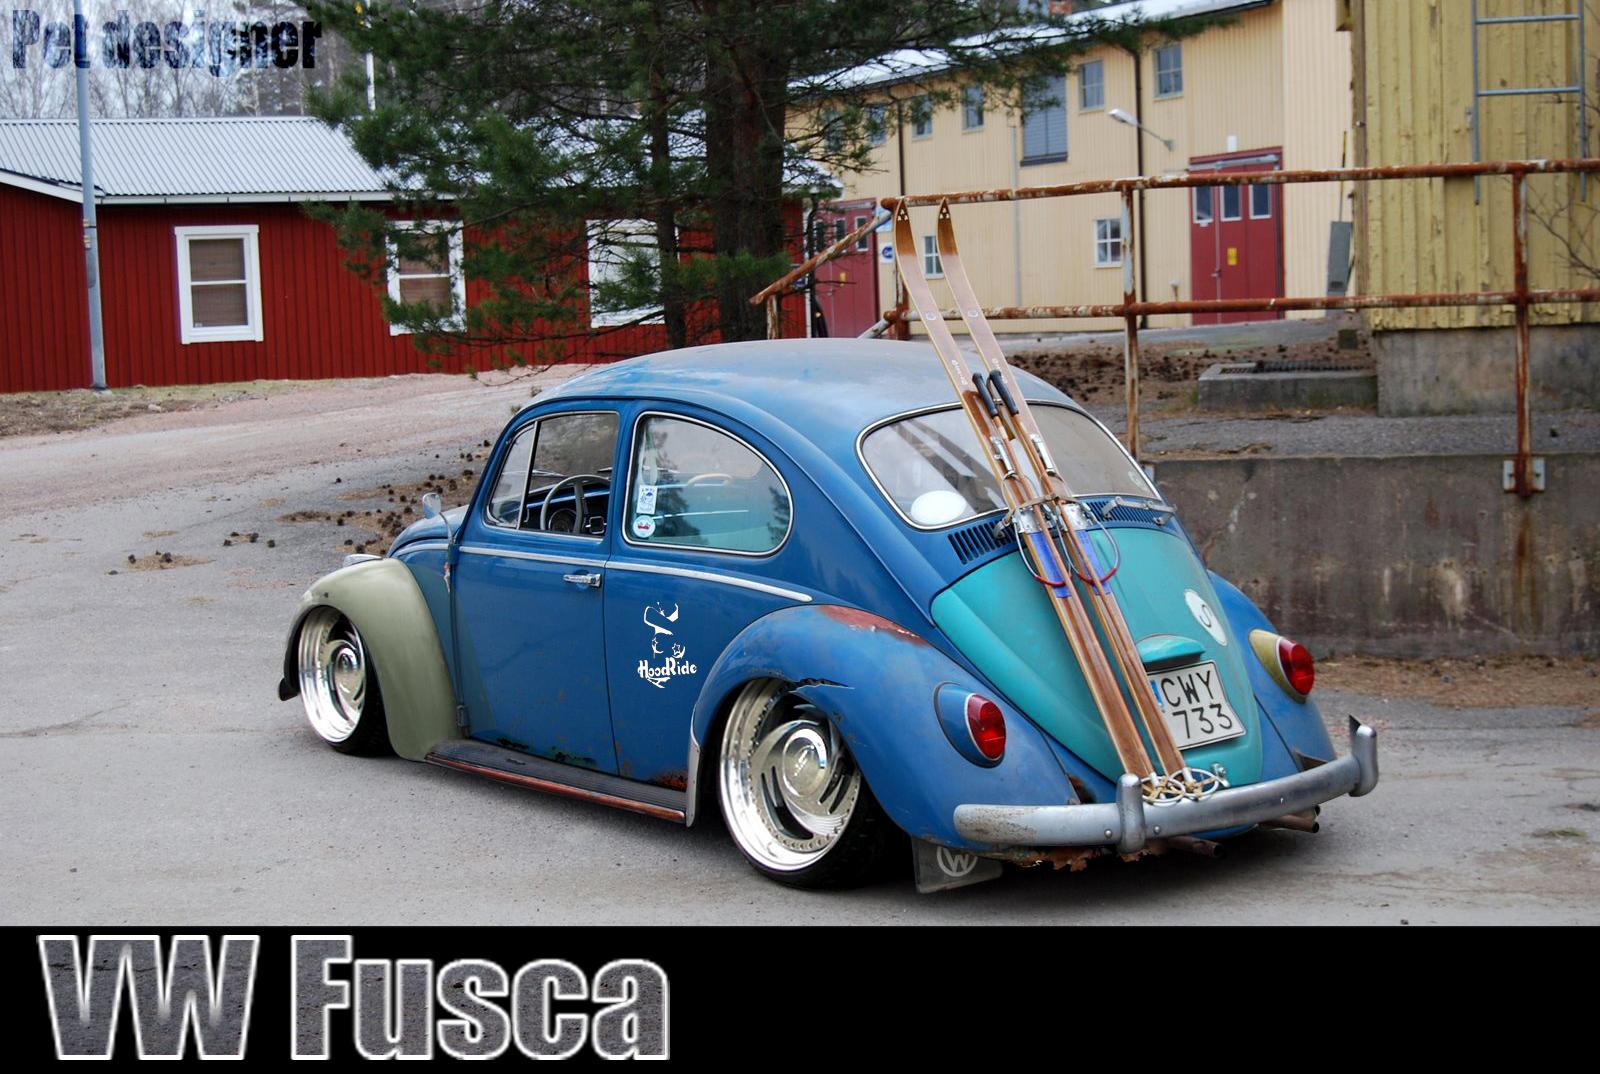 Vw Fusca Hoodride By Petdesigner On Deviantart